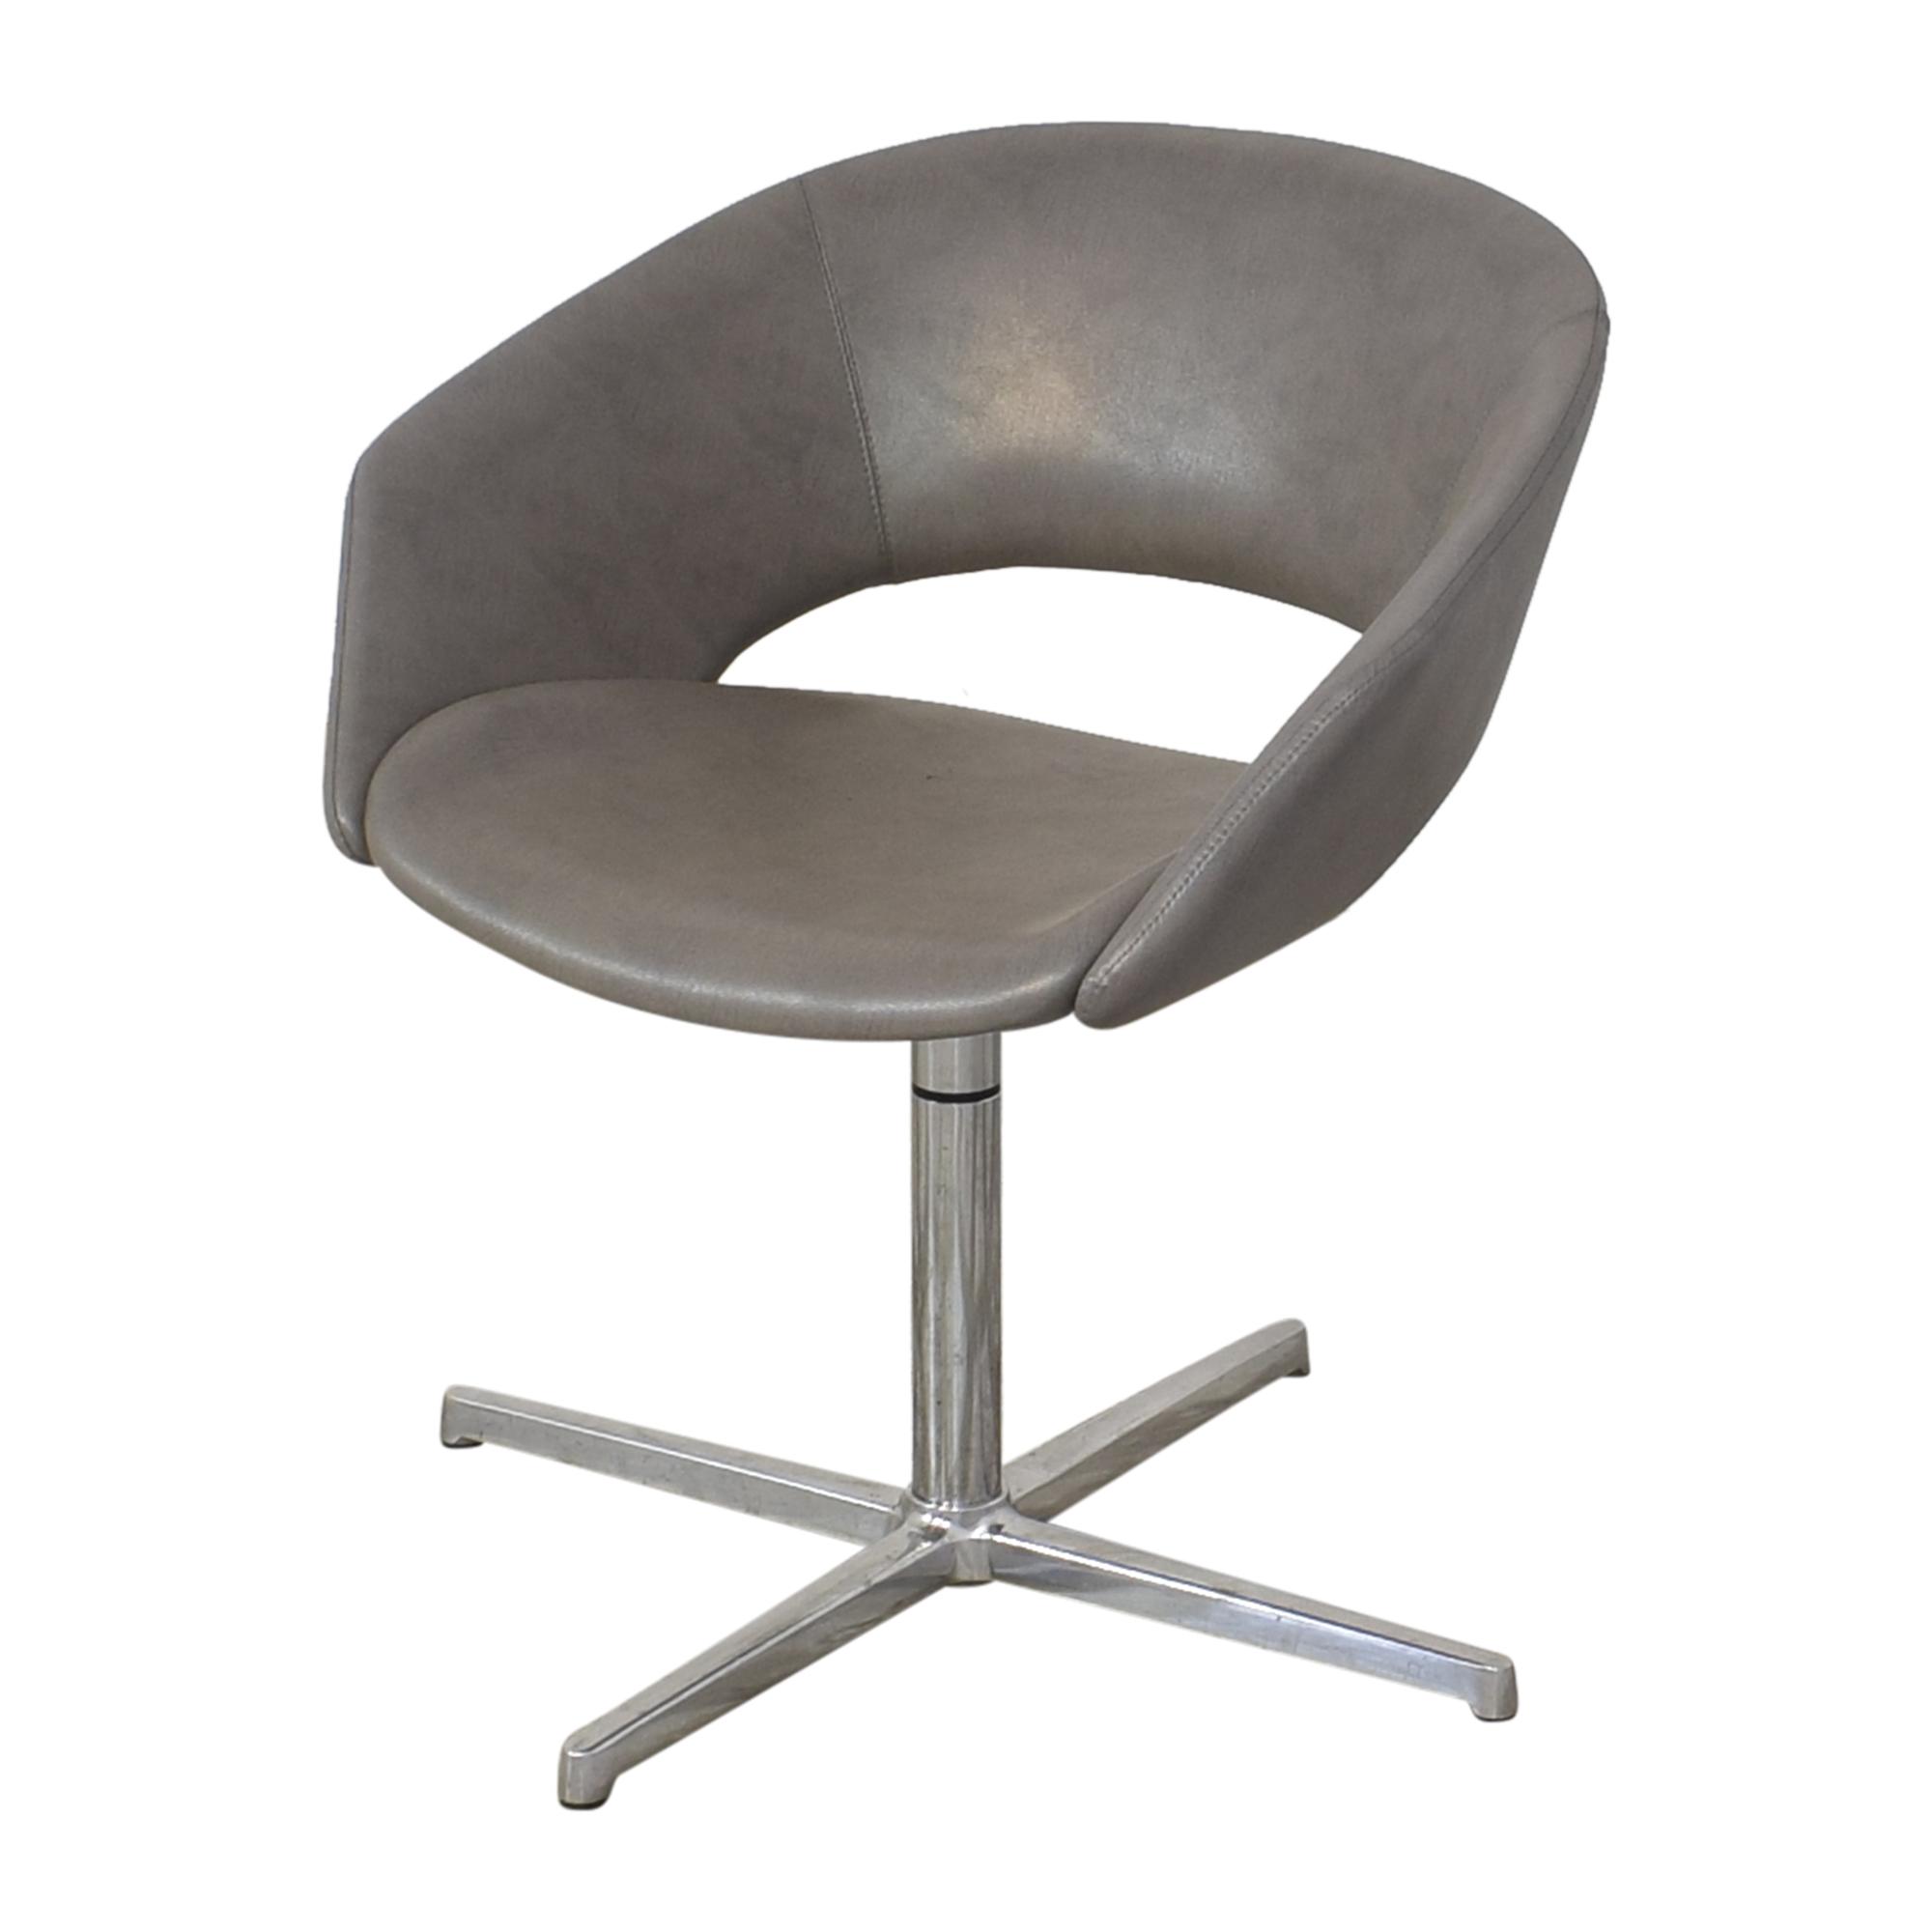 Leland International Leland Mod Pedestal Swivel Chair second hand